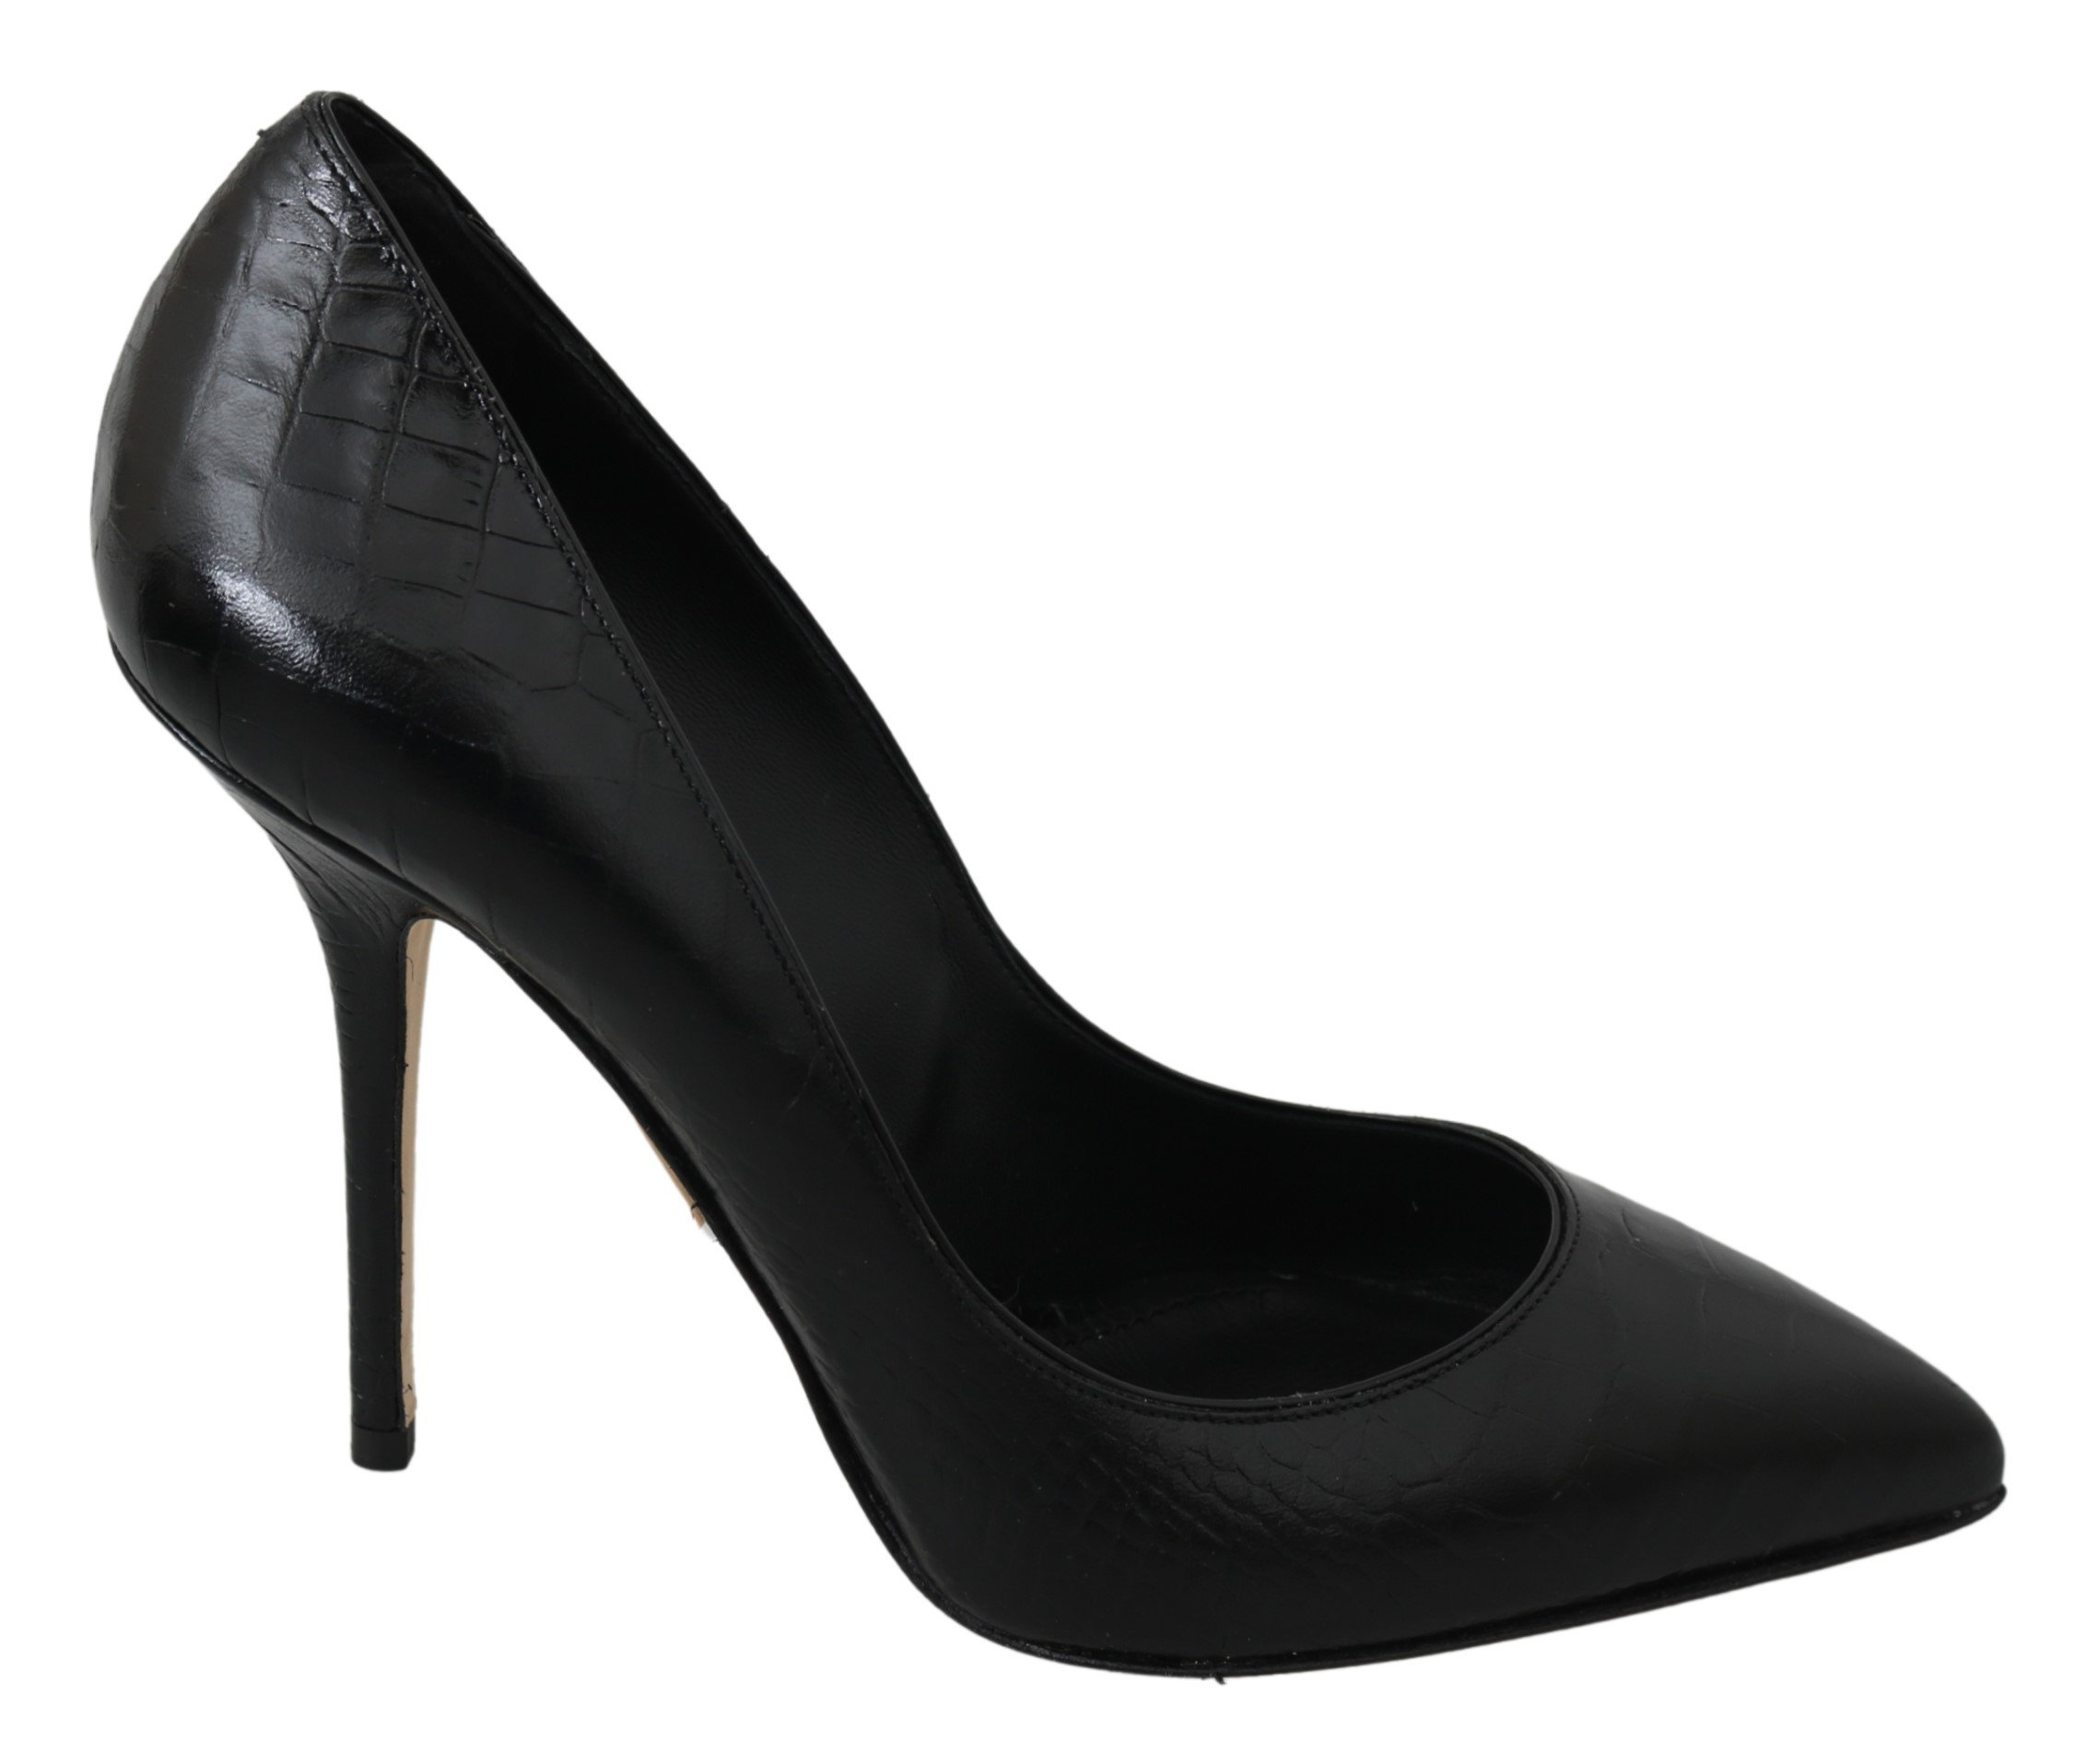 Dolce & Gabbana Women's Leather Bellucci High Pumps Black LA6874 - EU39/US8.5